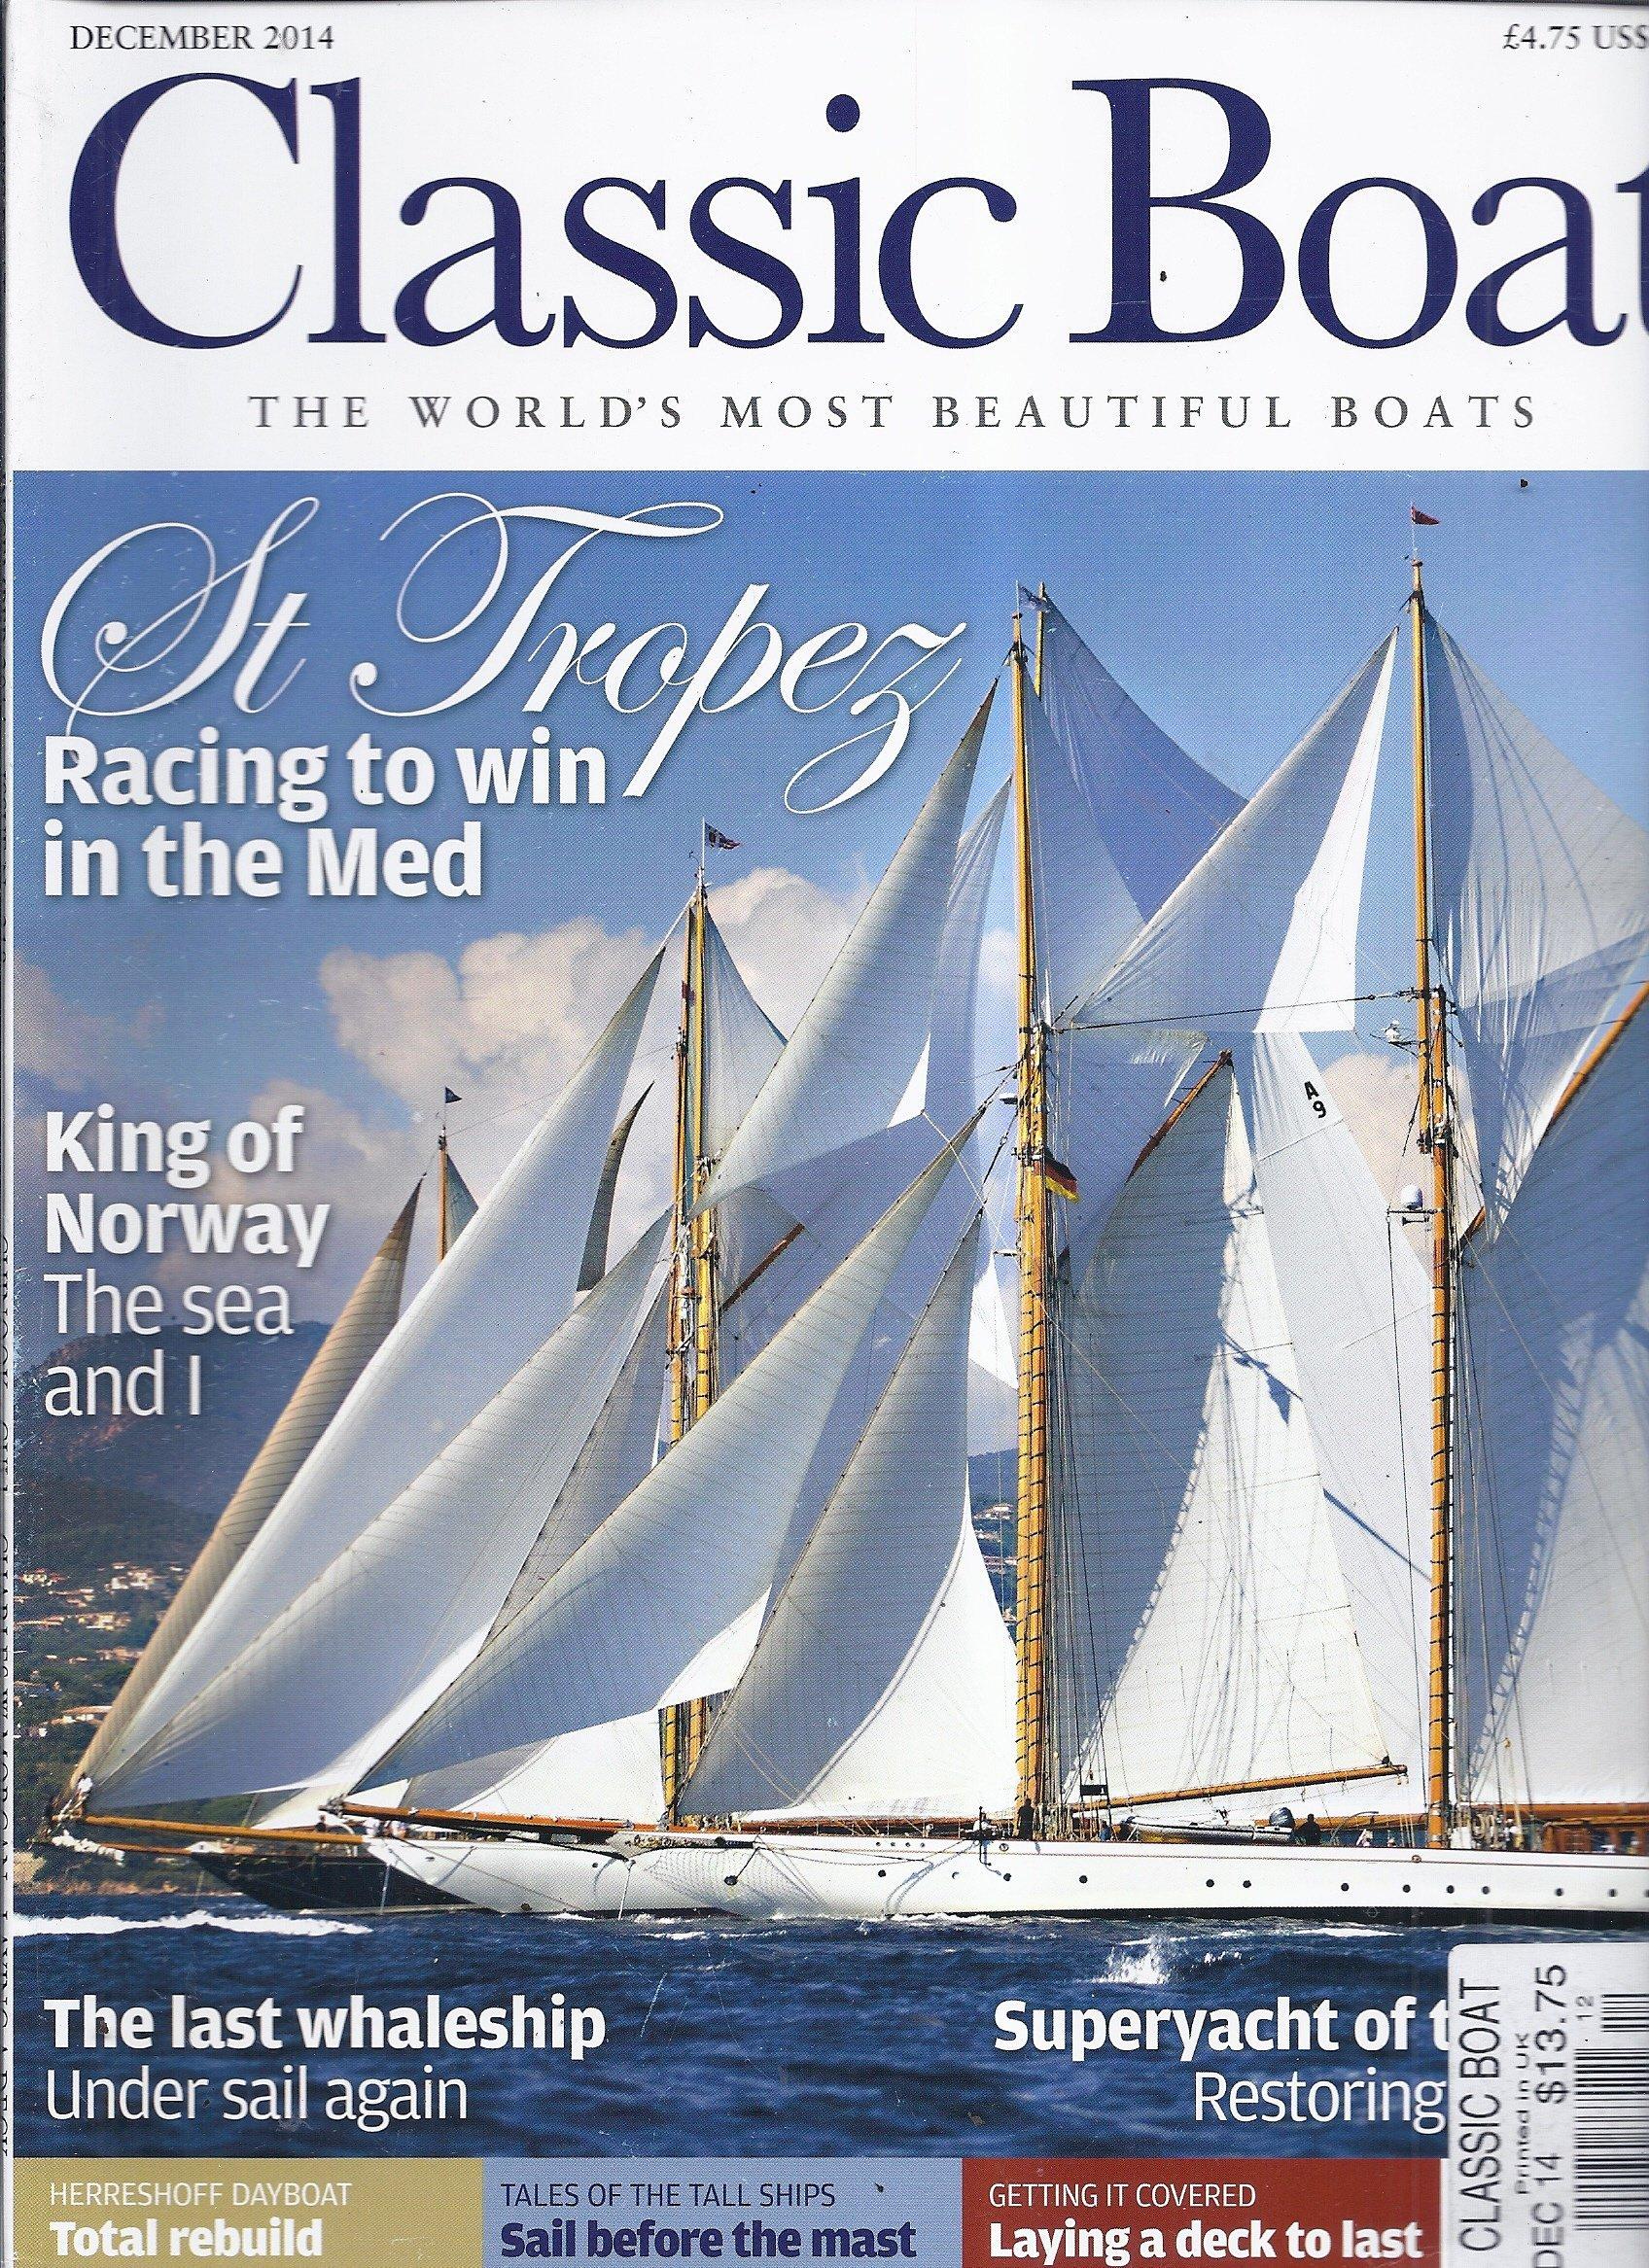 Classic Boat Magazine (December 2014 - St. Tropez) PDF